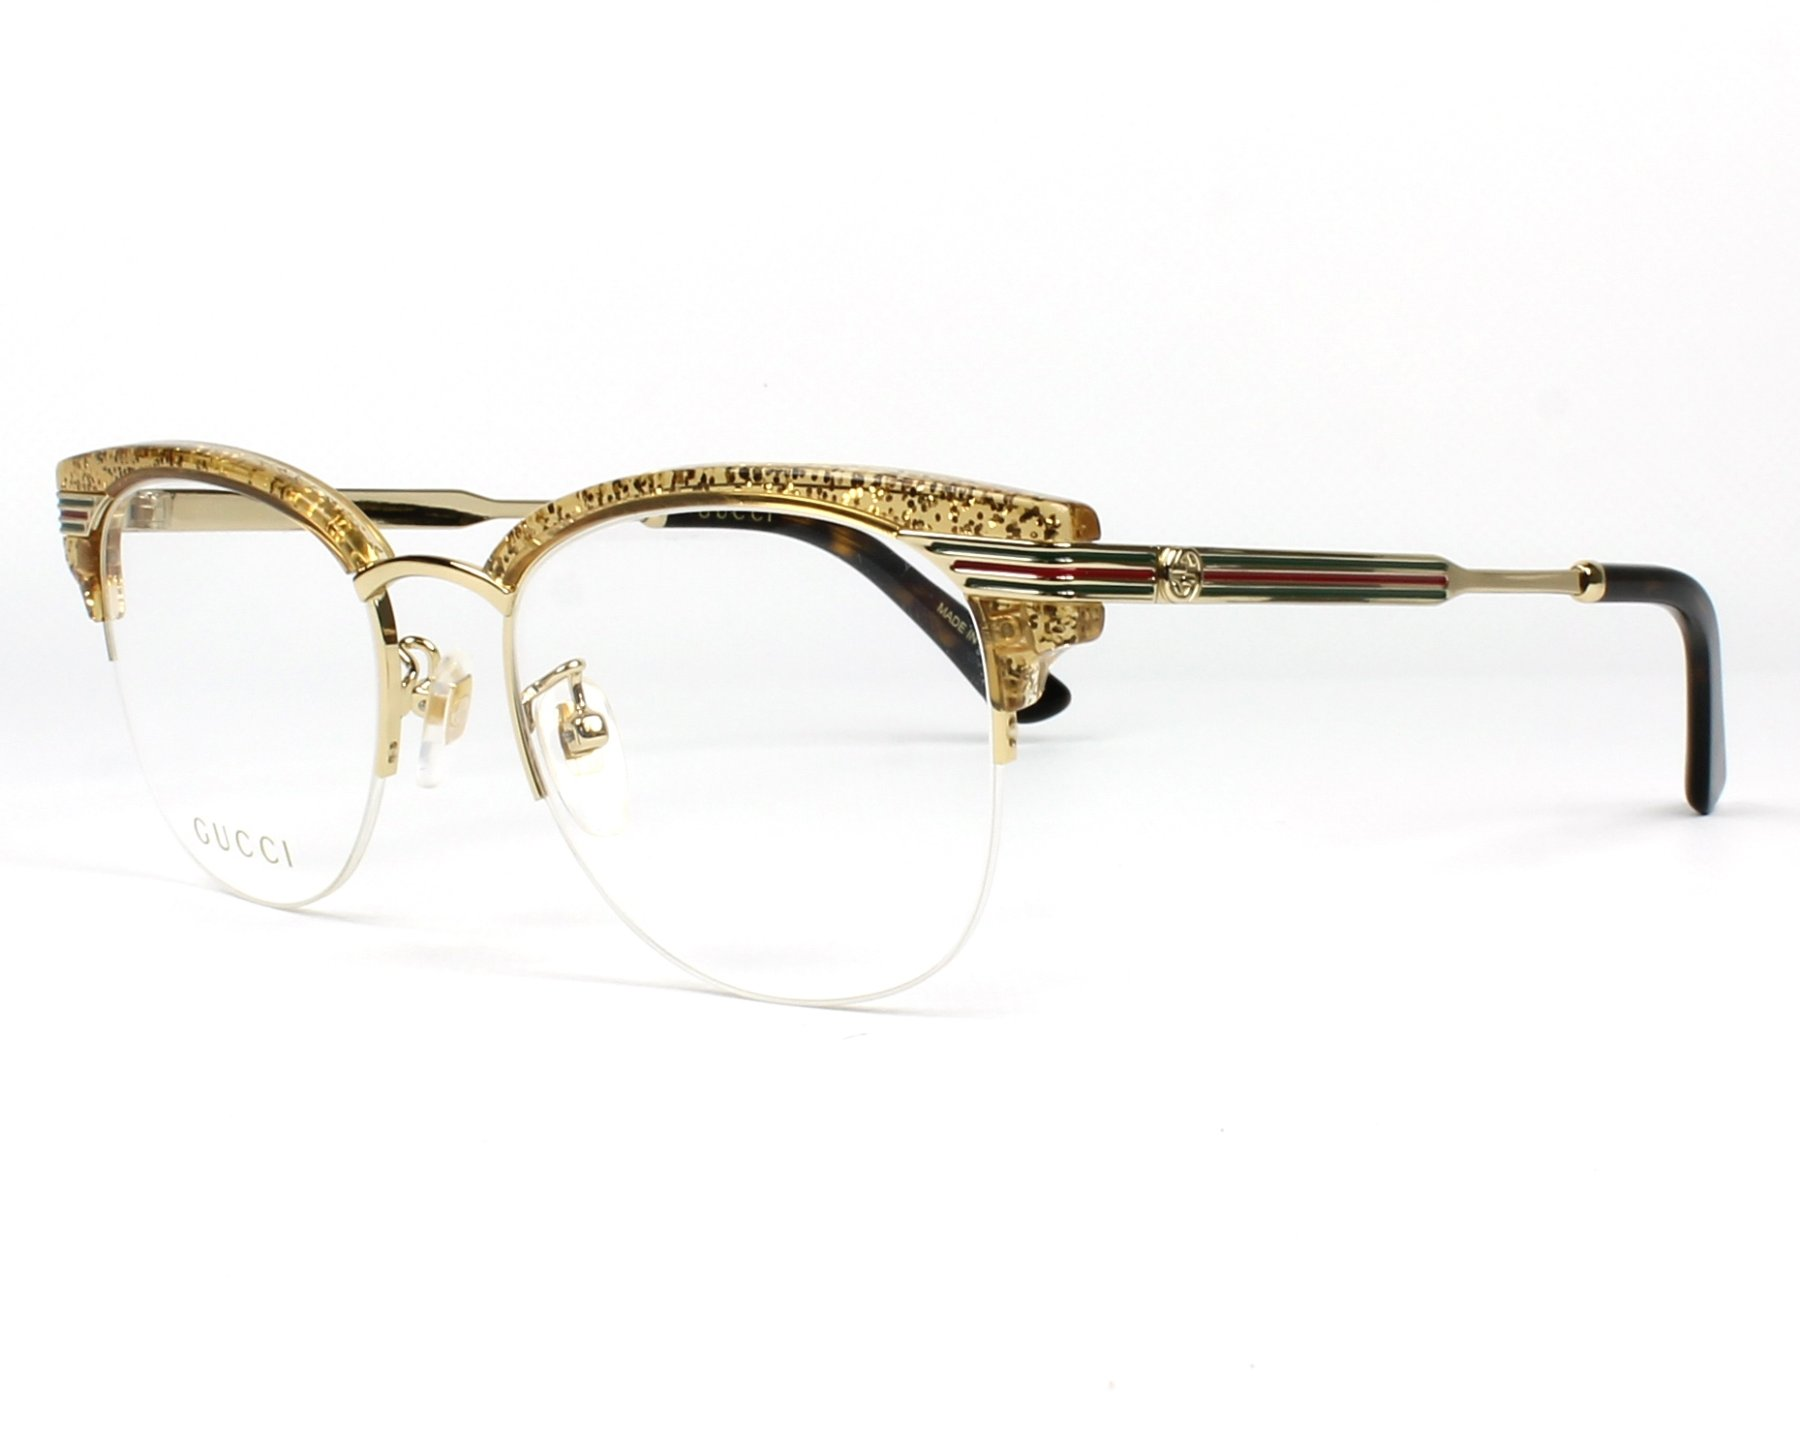 Gucci Eyeglasses Gg 0201 O 004 Gold Visionet